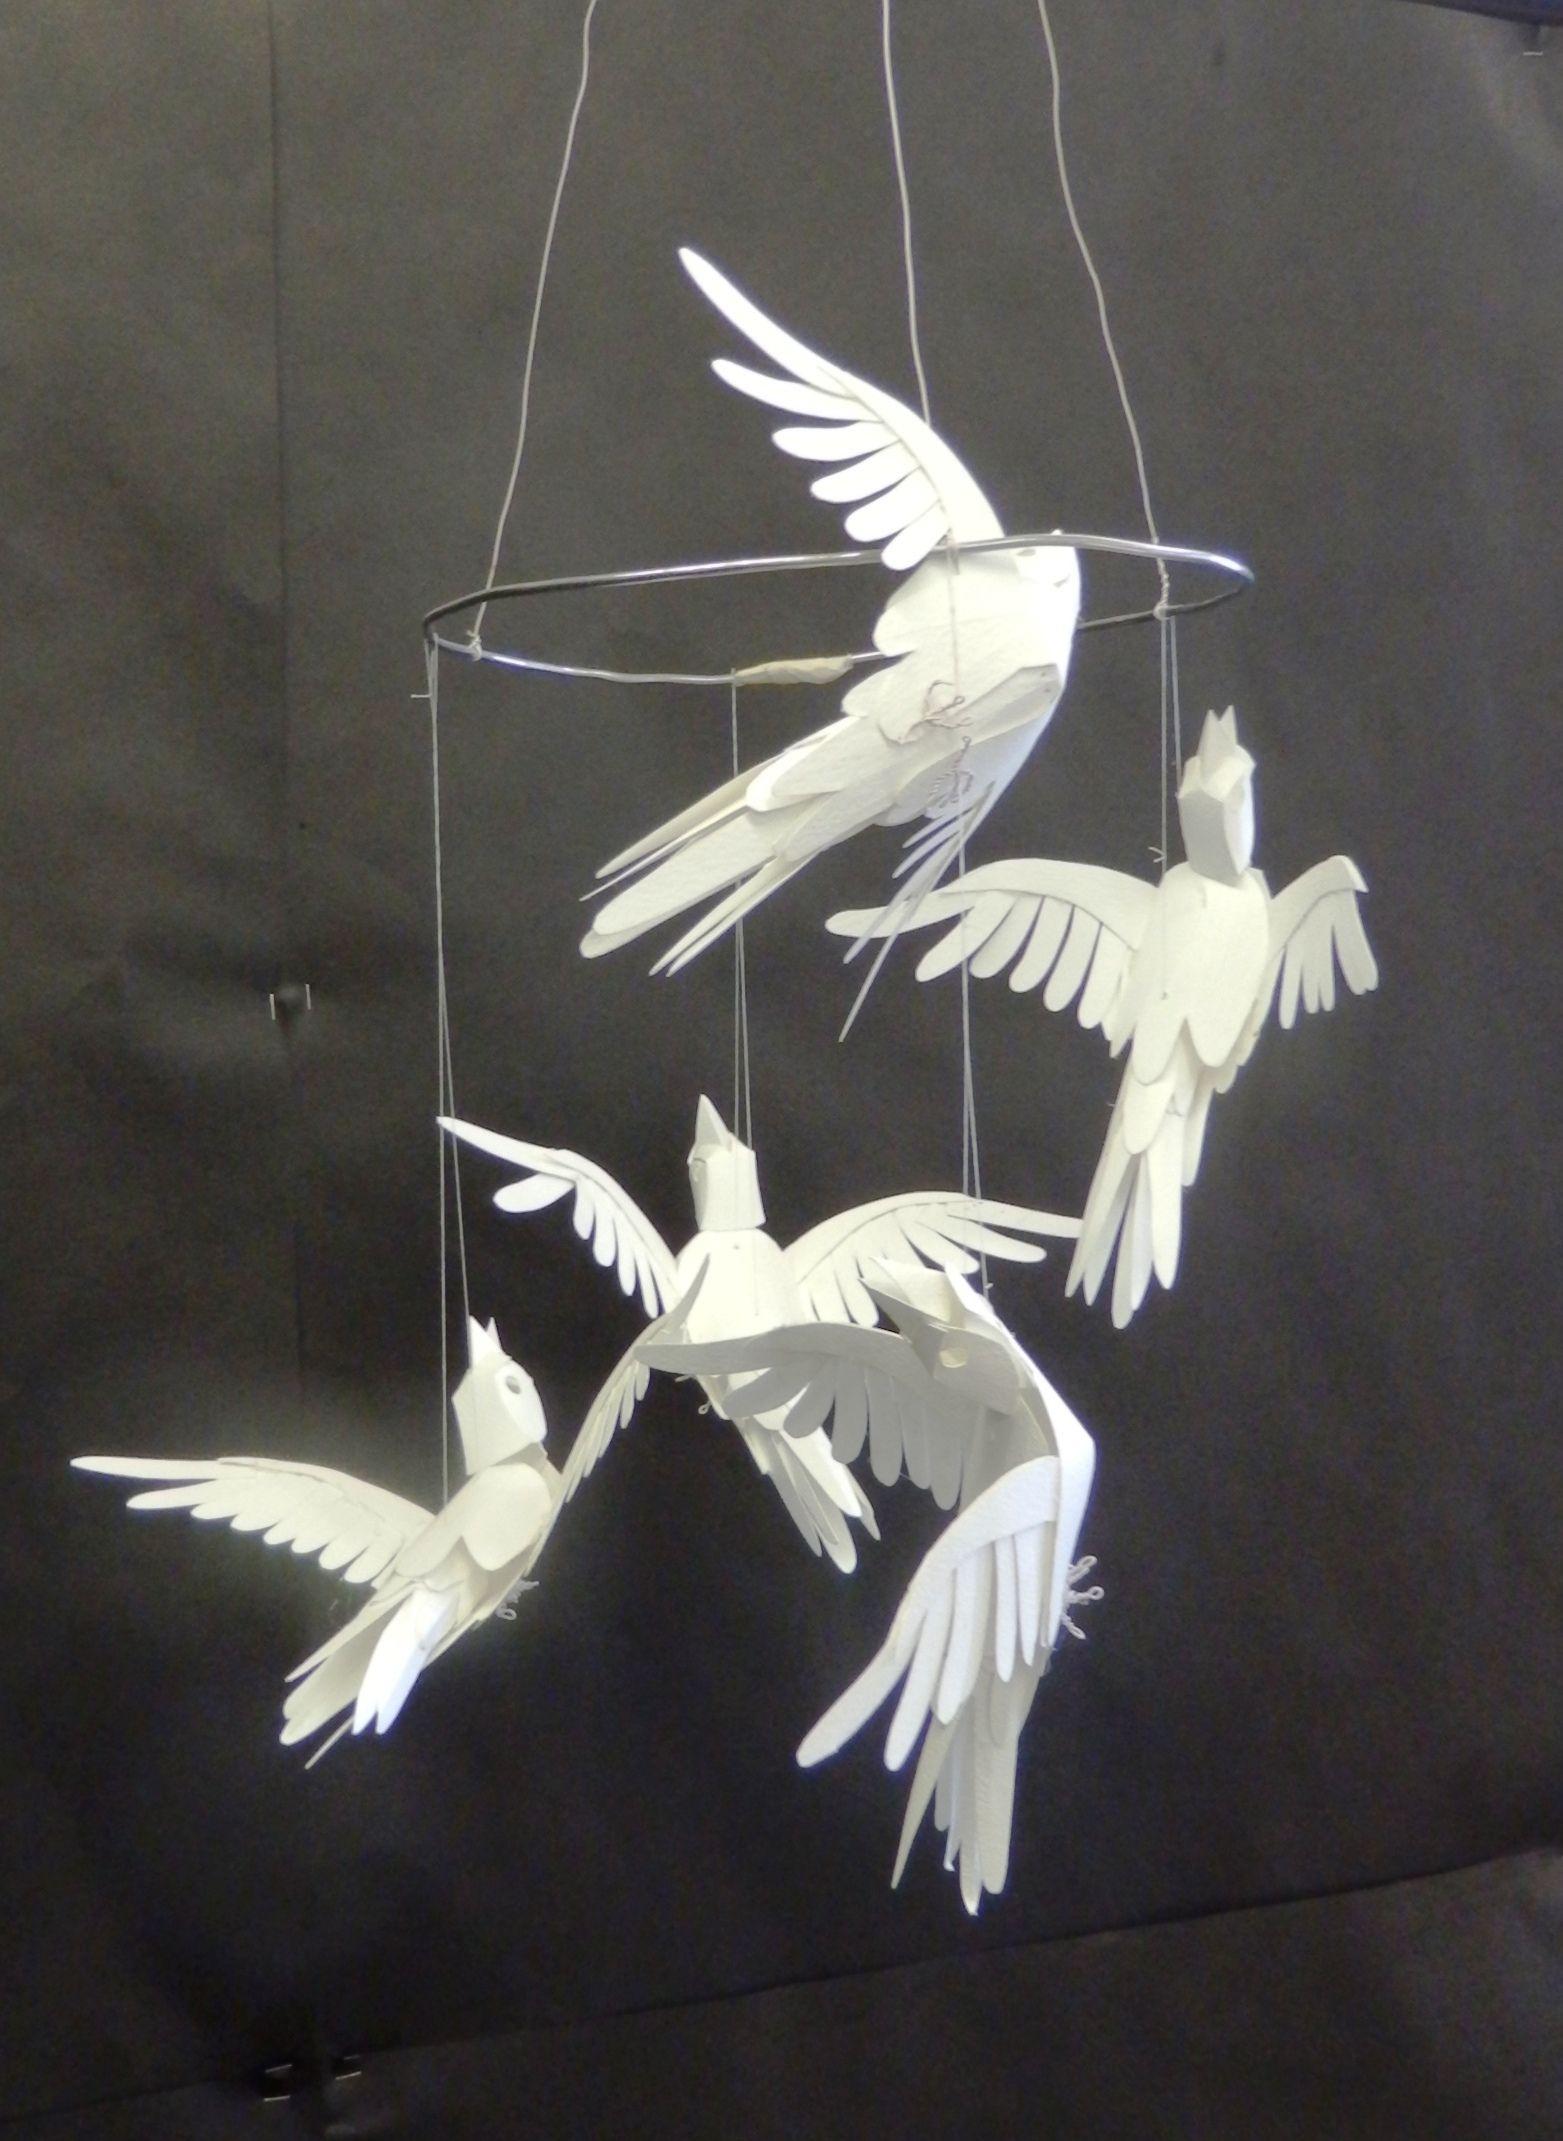 Gcse Art Final Piece By Pupil From Orleans Park School